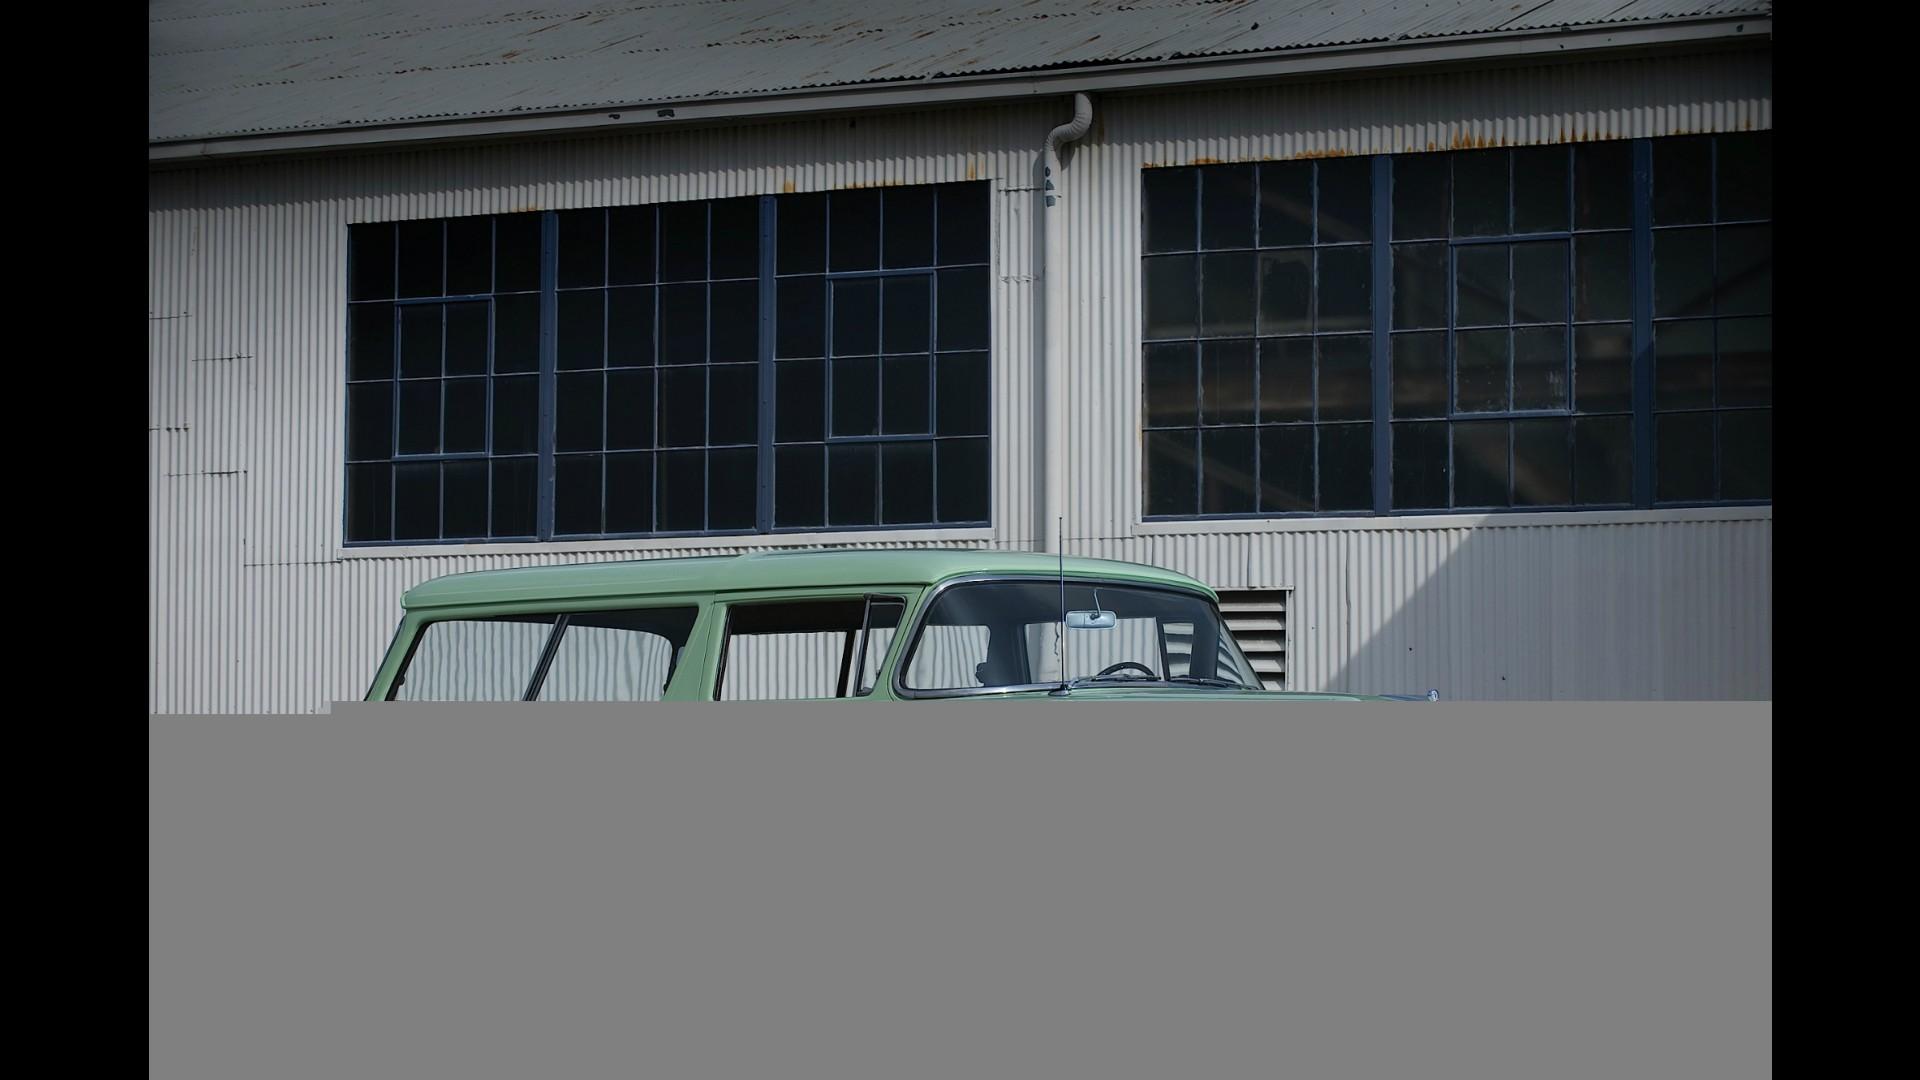 Ford Ranch Station Wagon